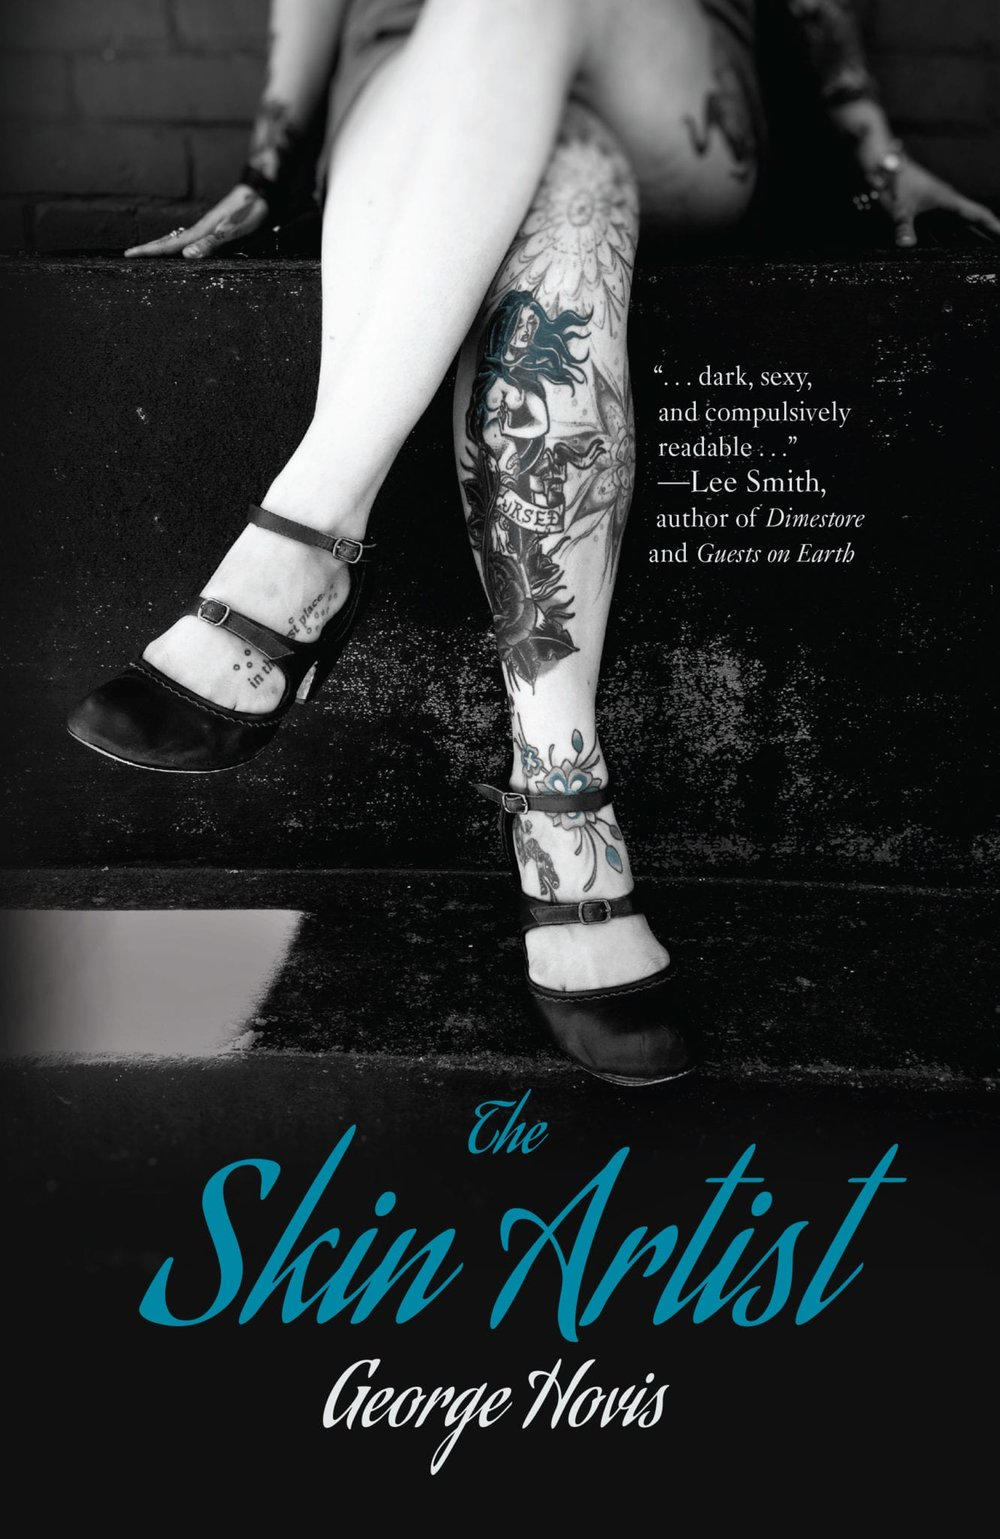 The Skin Artist by George Hovis (April 2019, SFK Press)